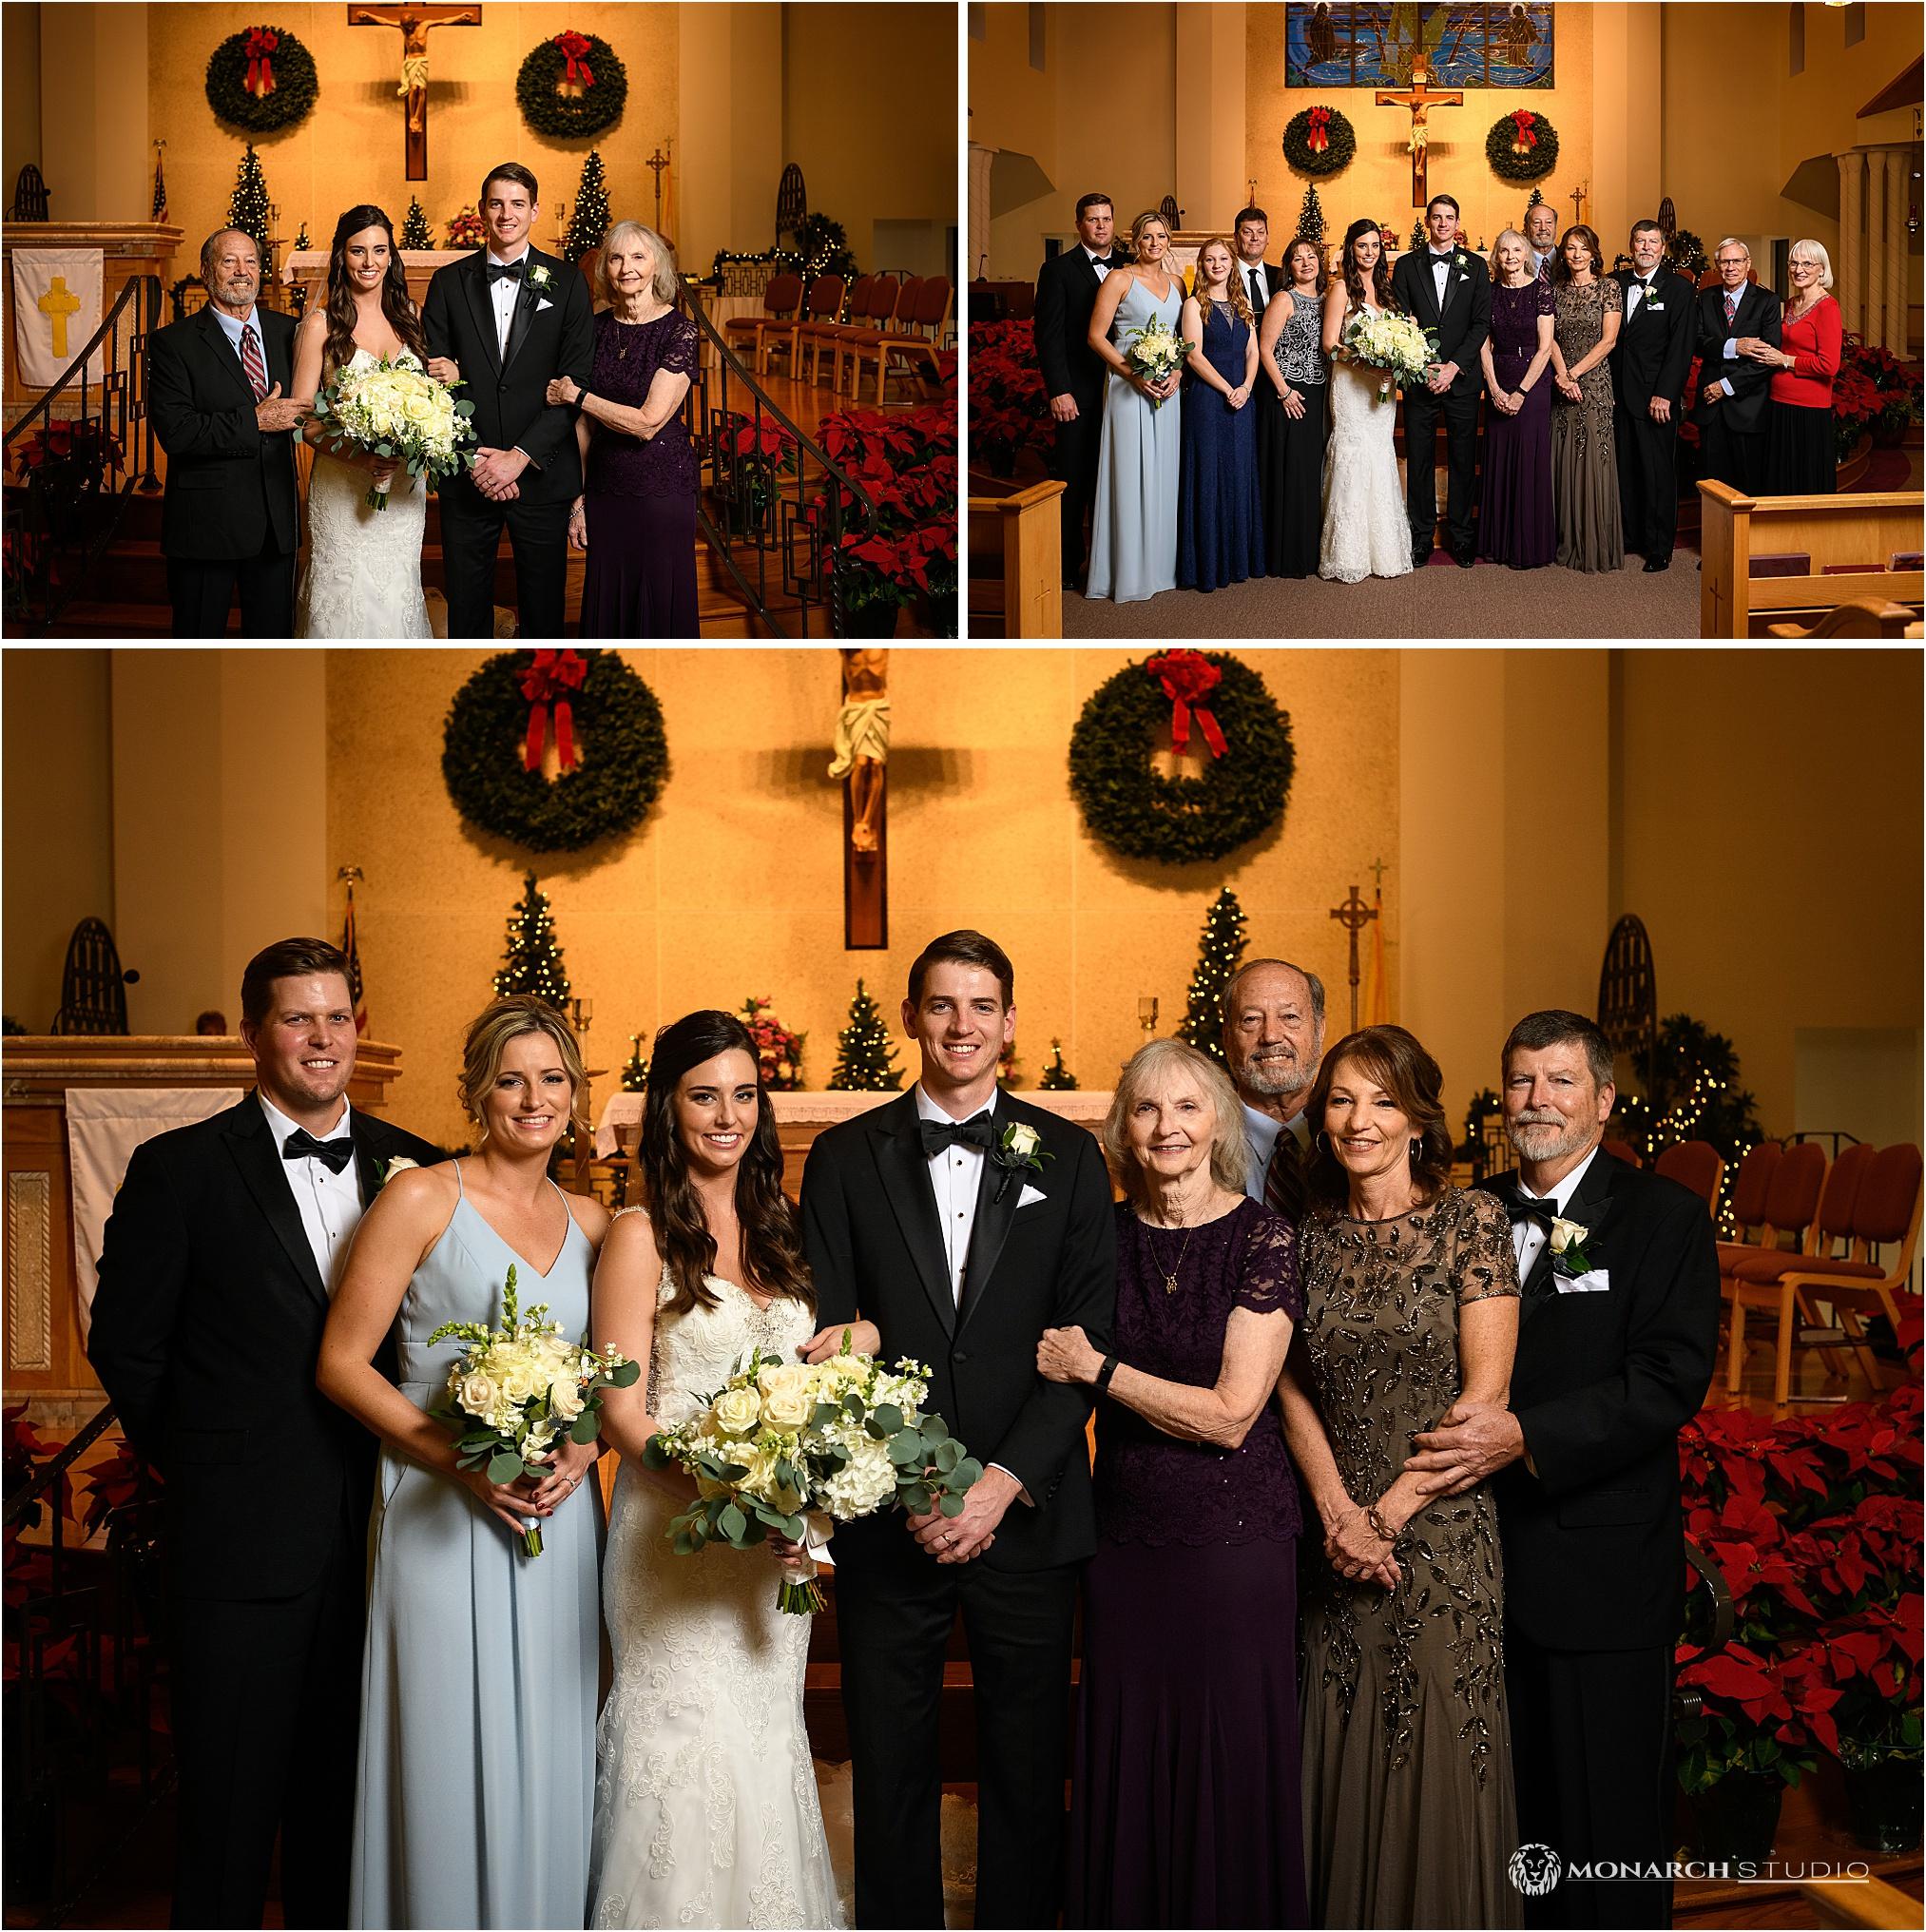 saint-augustine-wedding-photographer-treasury-055.jpg